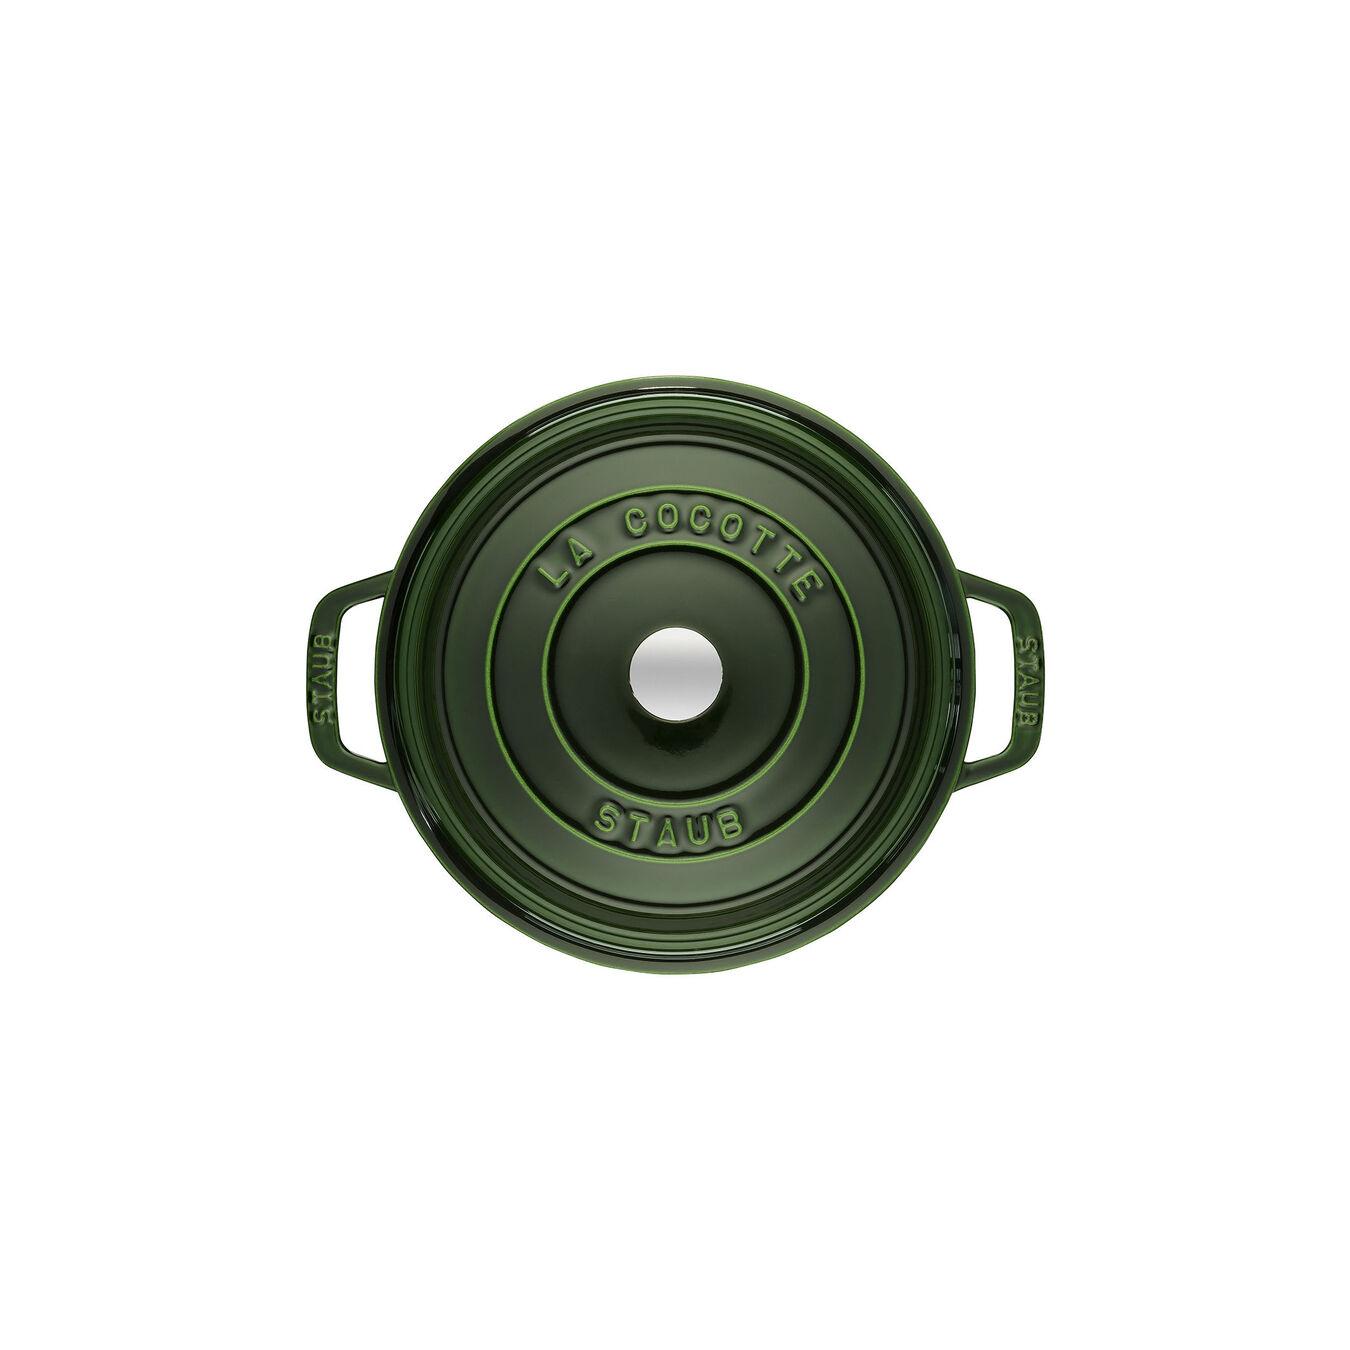 Döküm Tencere | Fesleğen | 22 cm | 2,5 l | yuvarlak,,large 2